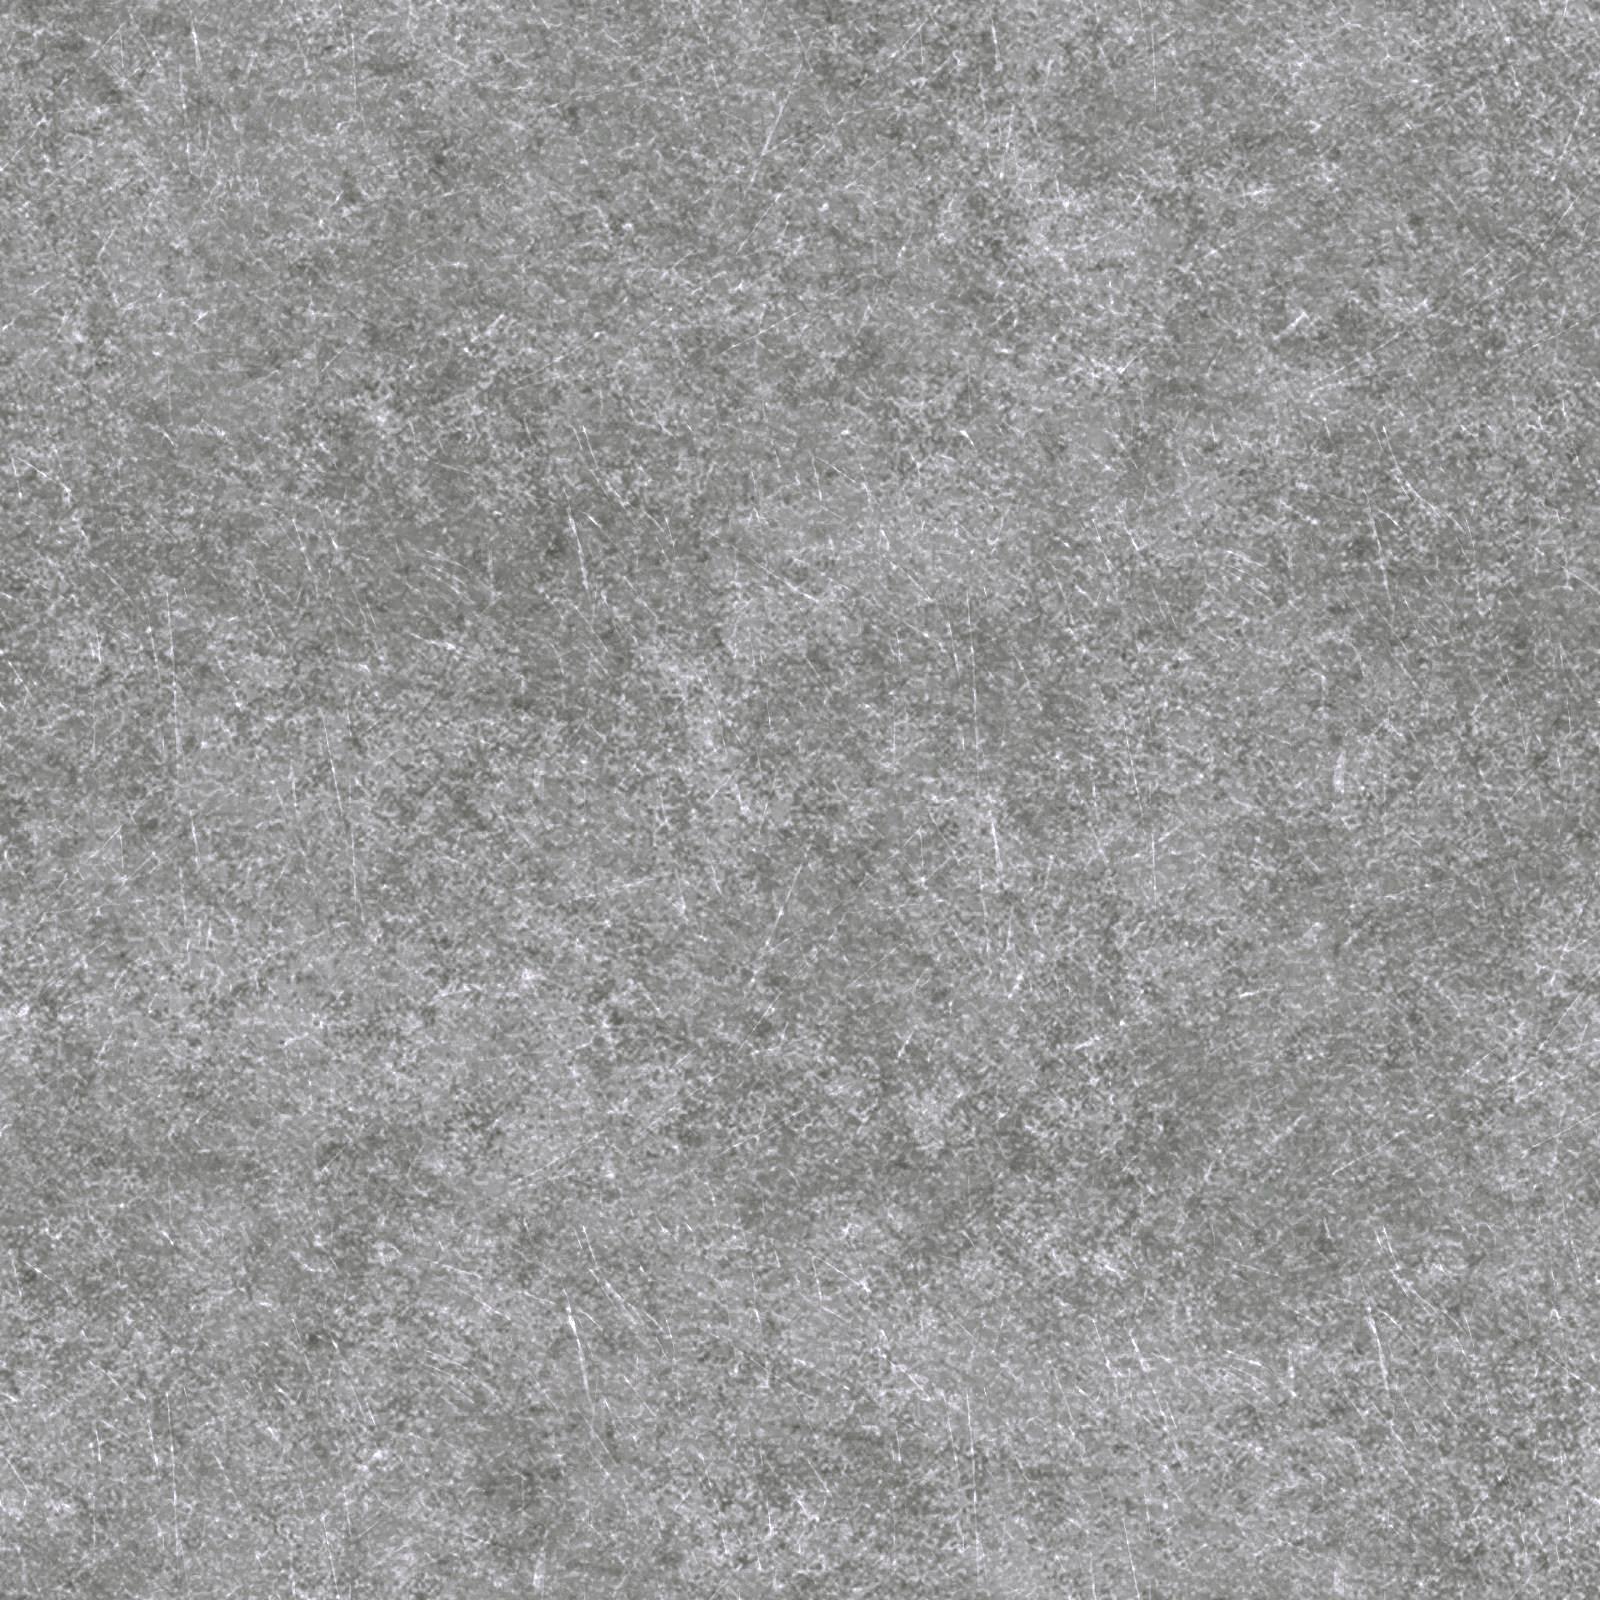 Seamless  metal texture  rust texture  dirty metal texture  metal plate  texture. High Resolution Seamless Textures  Free Seamless Metal Textures